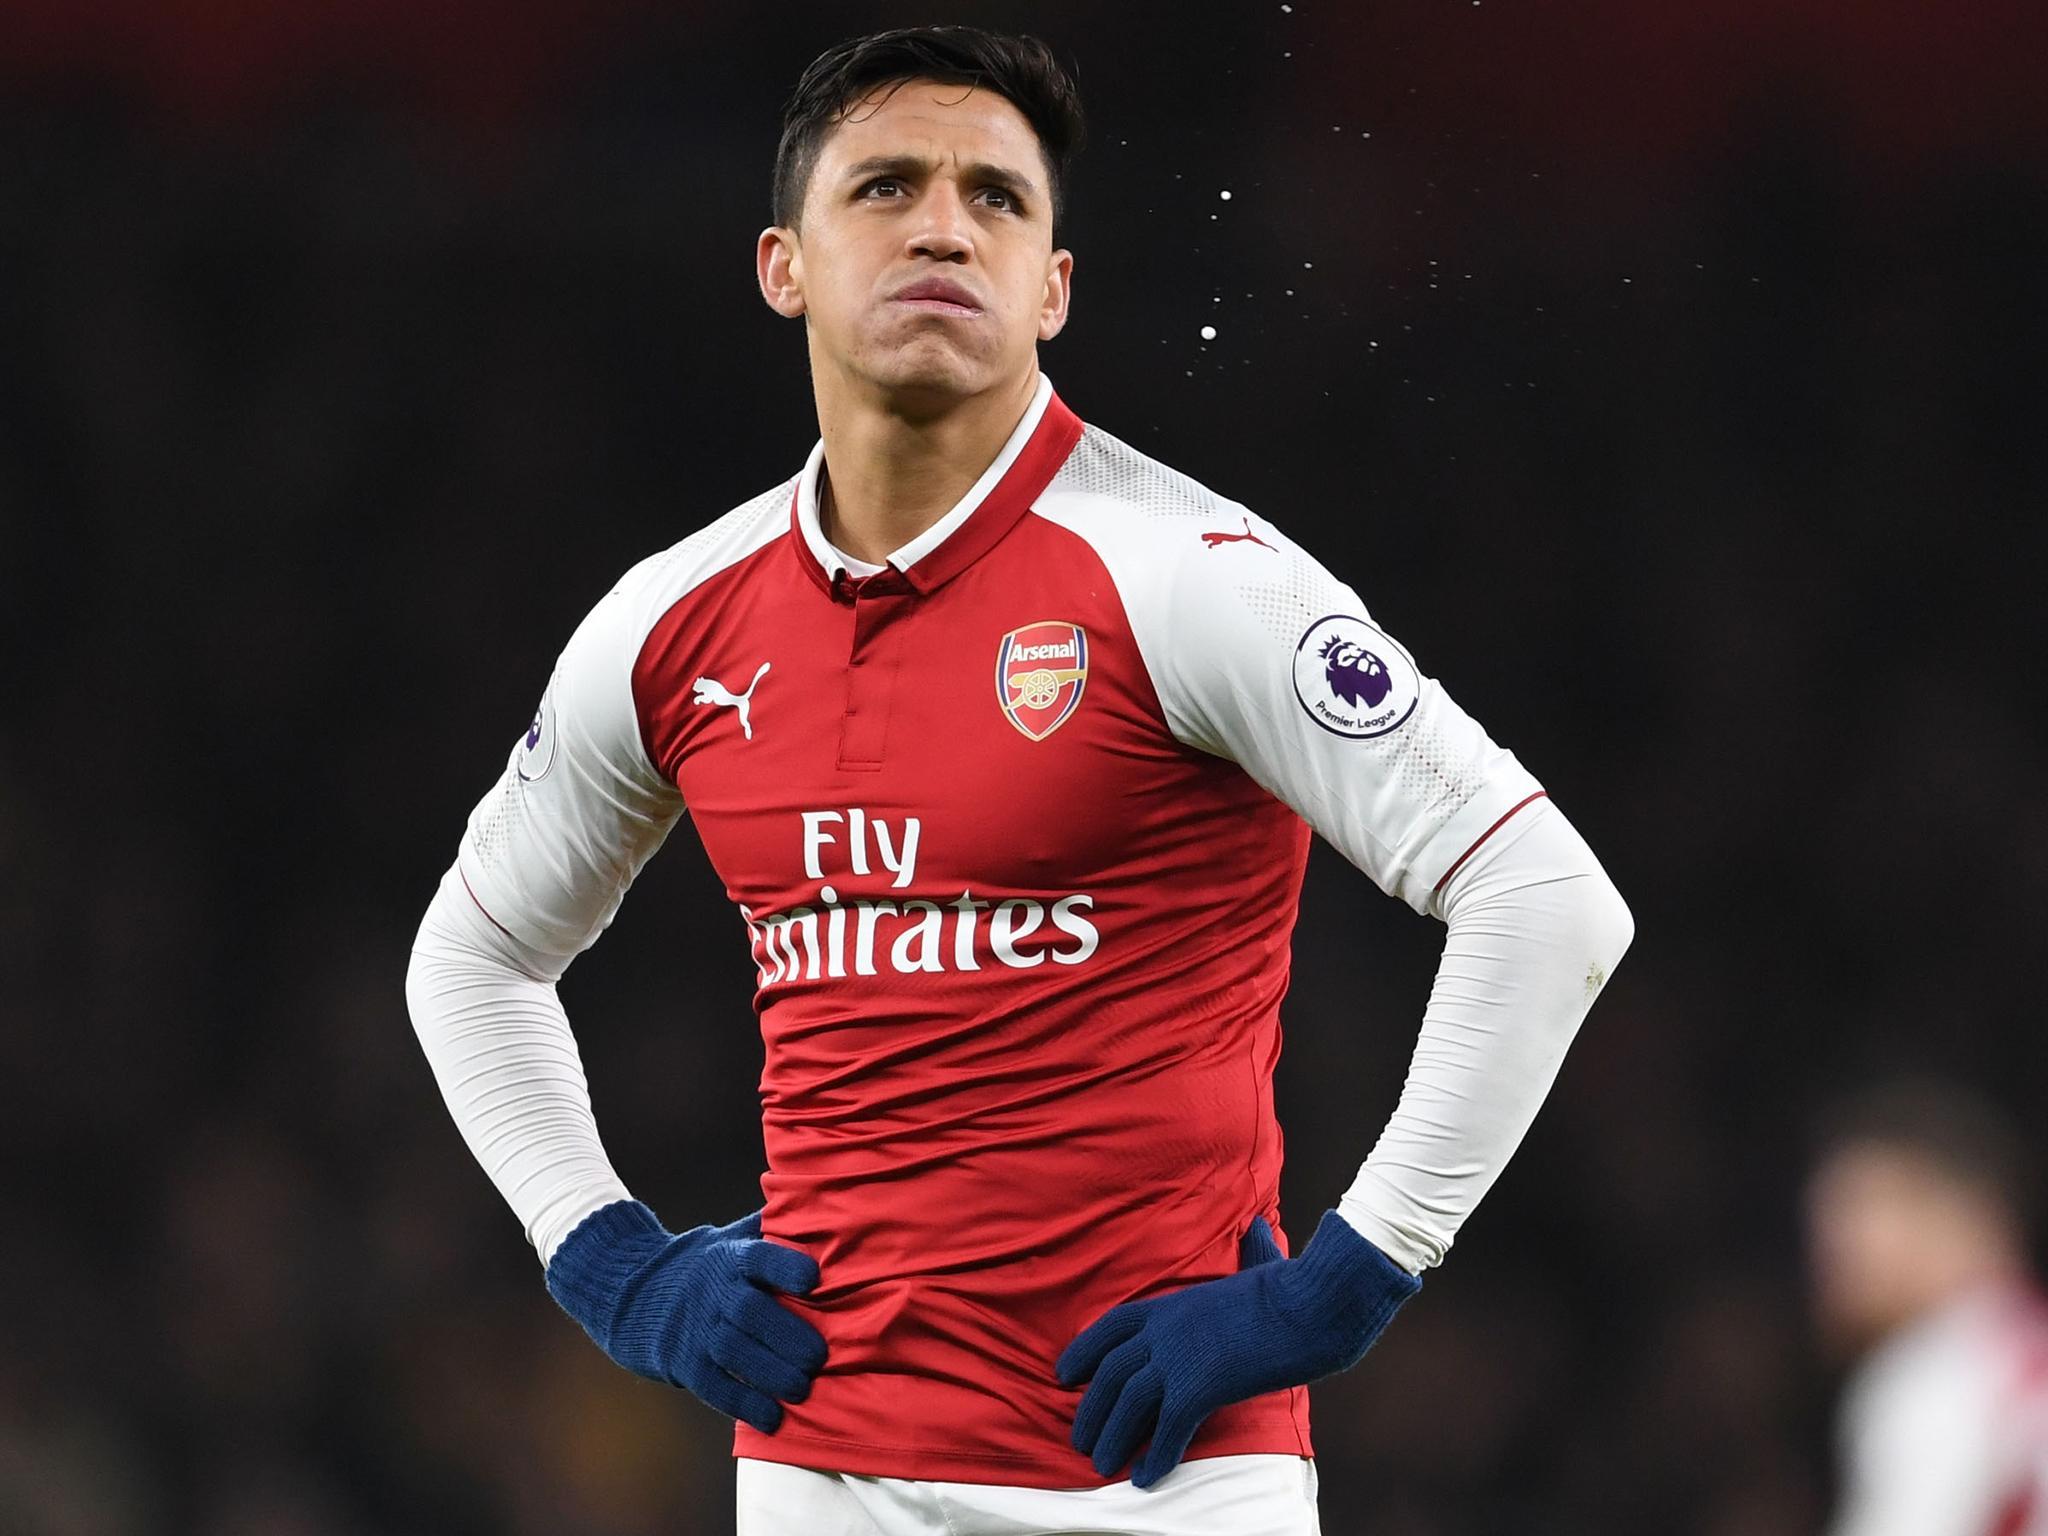 Transfer news LIVE: Alexis Sanchez's Manchester United deal close, Arsenal, Liverpool and Spurs latest plus deals